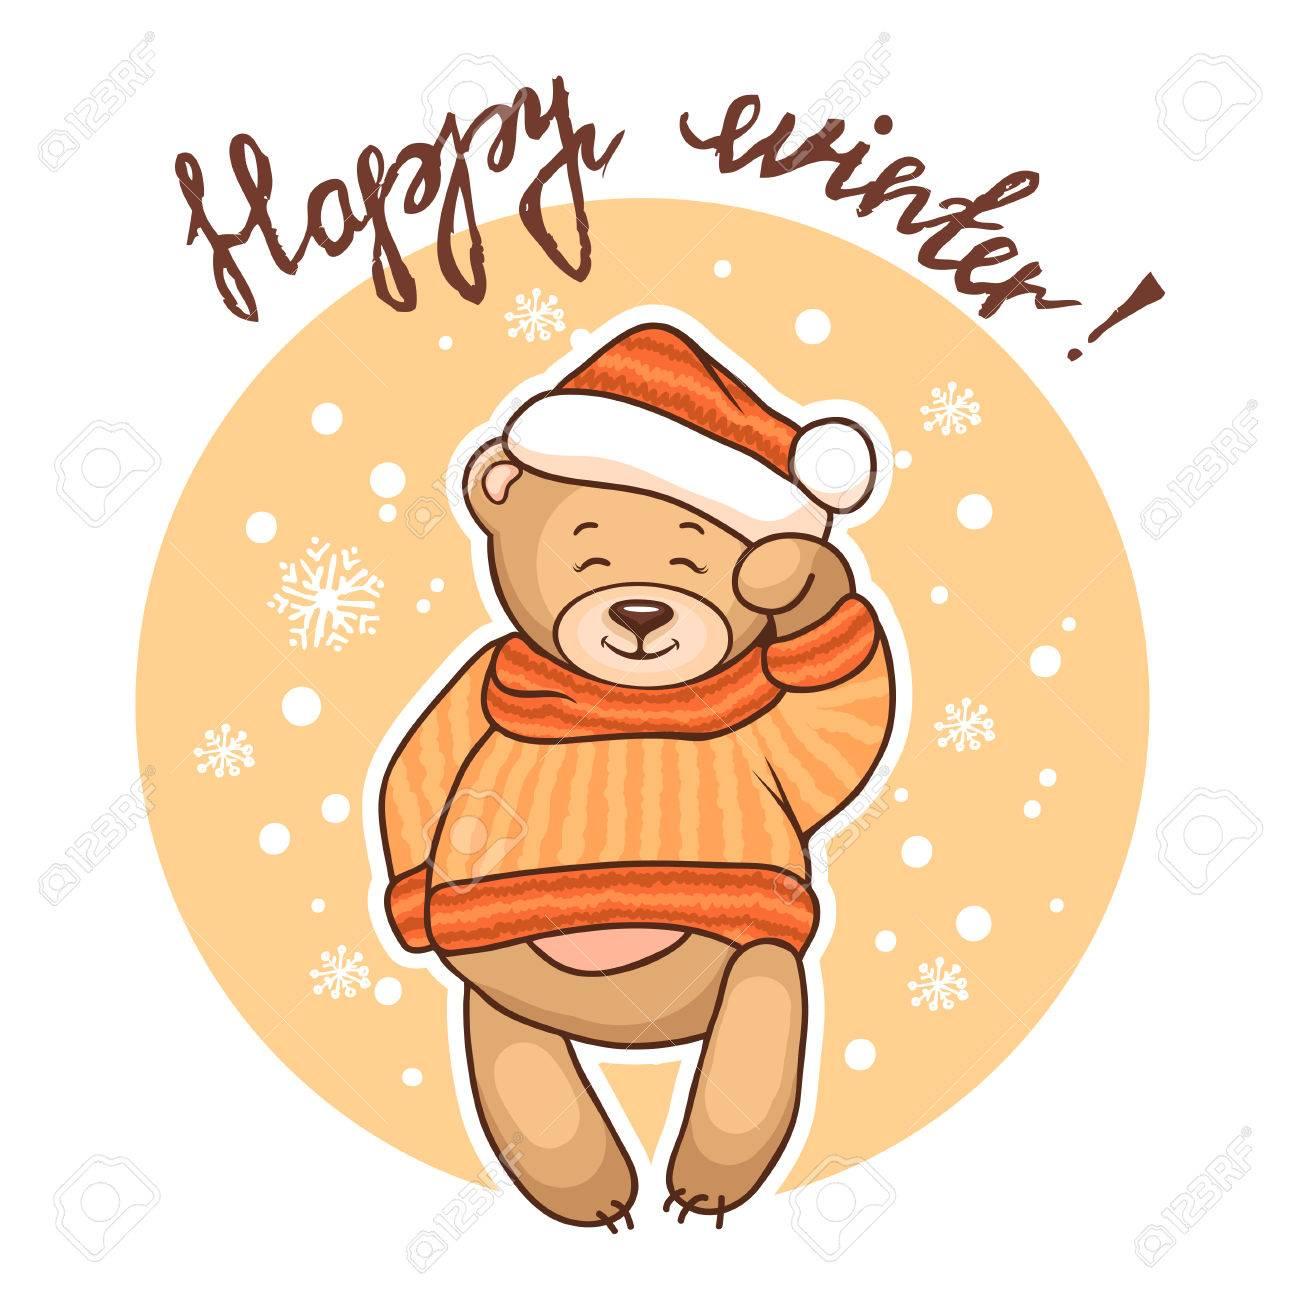 Cute Illustration Of Christmas Teddy Bear, For Xmas Design. Funny ...